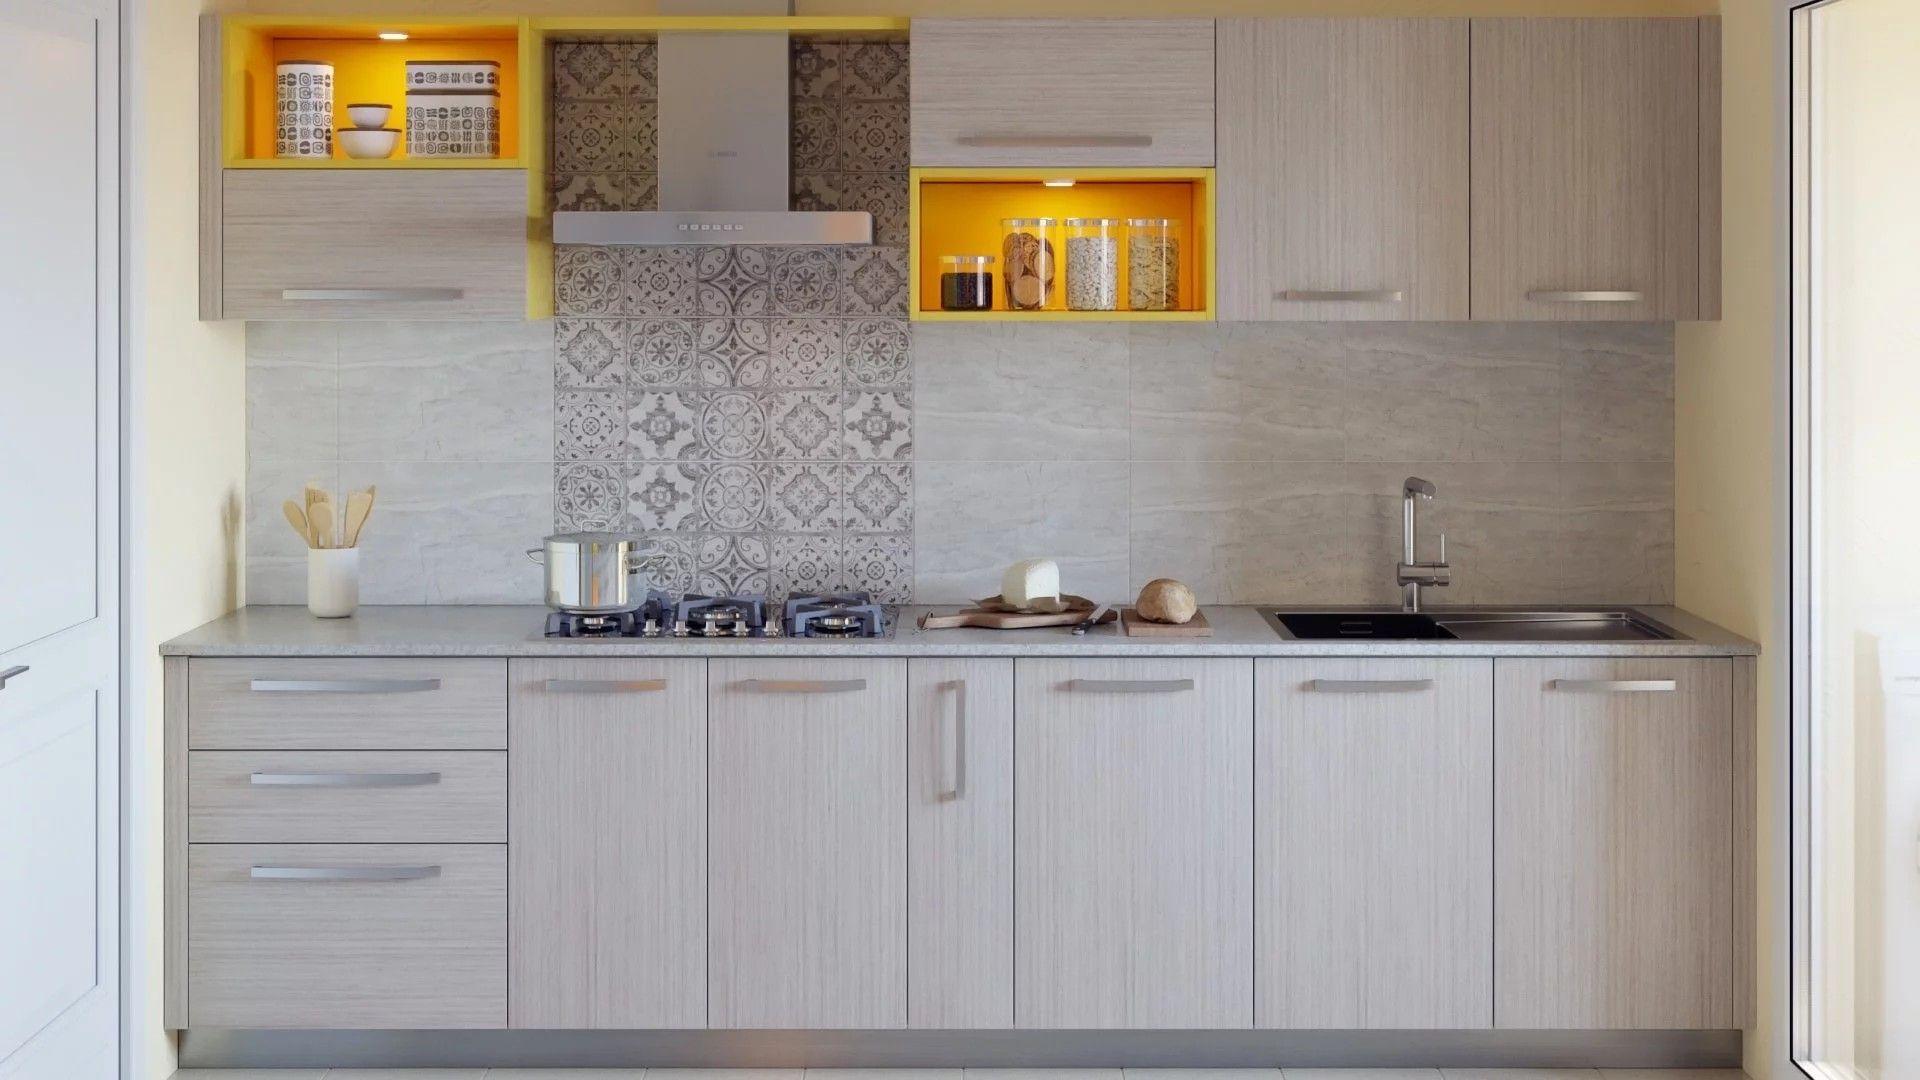 pin by mohita rungta on kitchen decor kitchen kitchen design kitchen decor on kitchen interior parallel id=59218